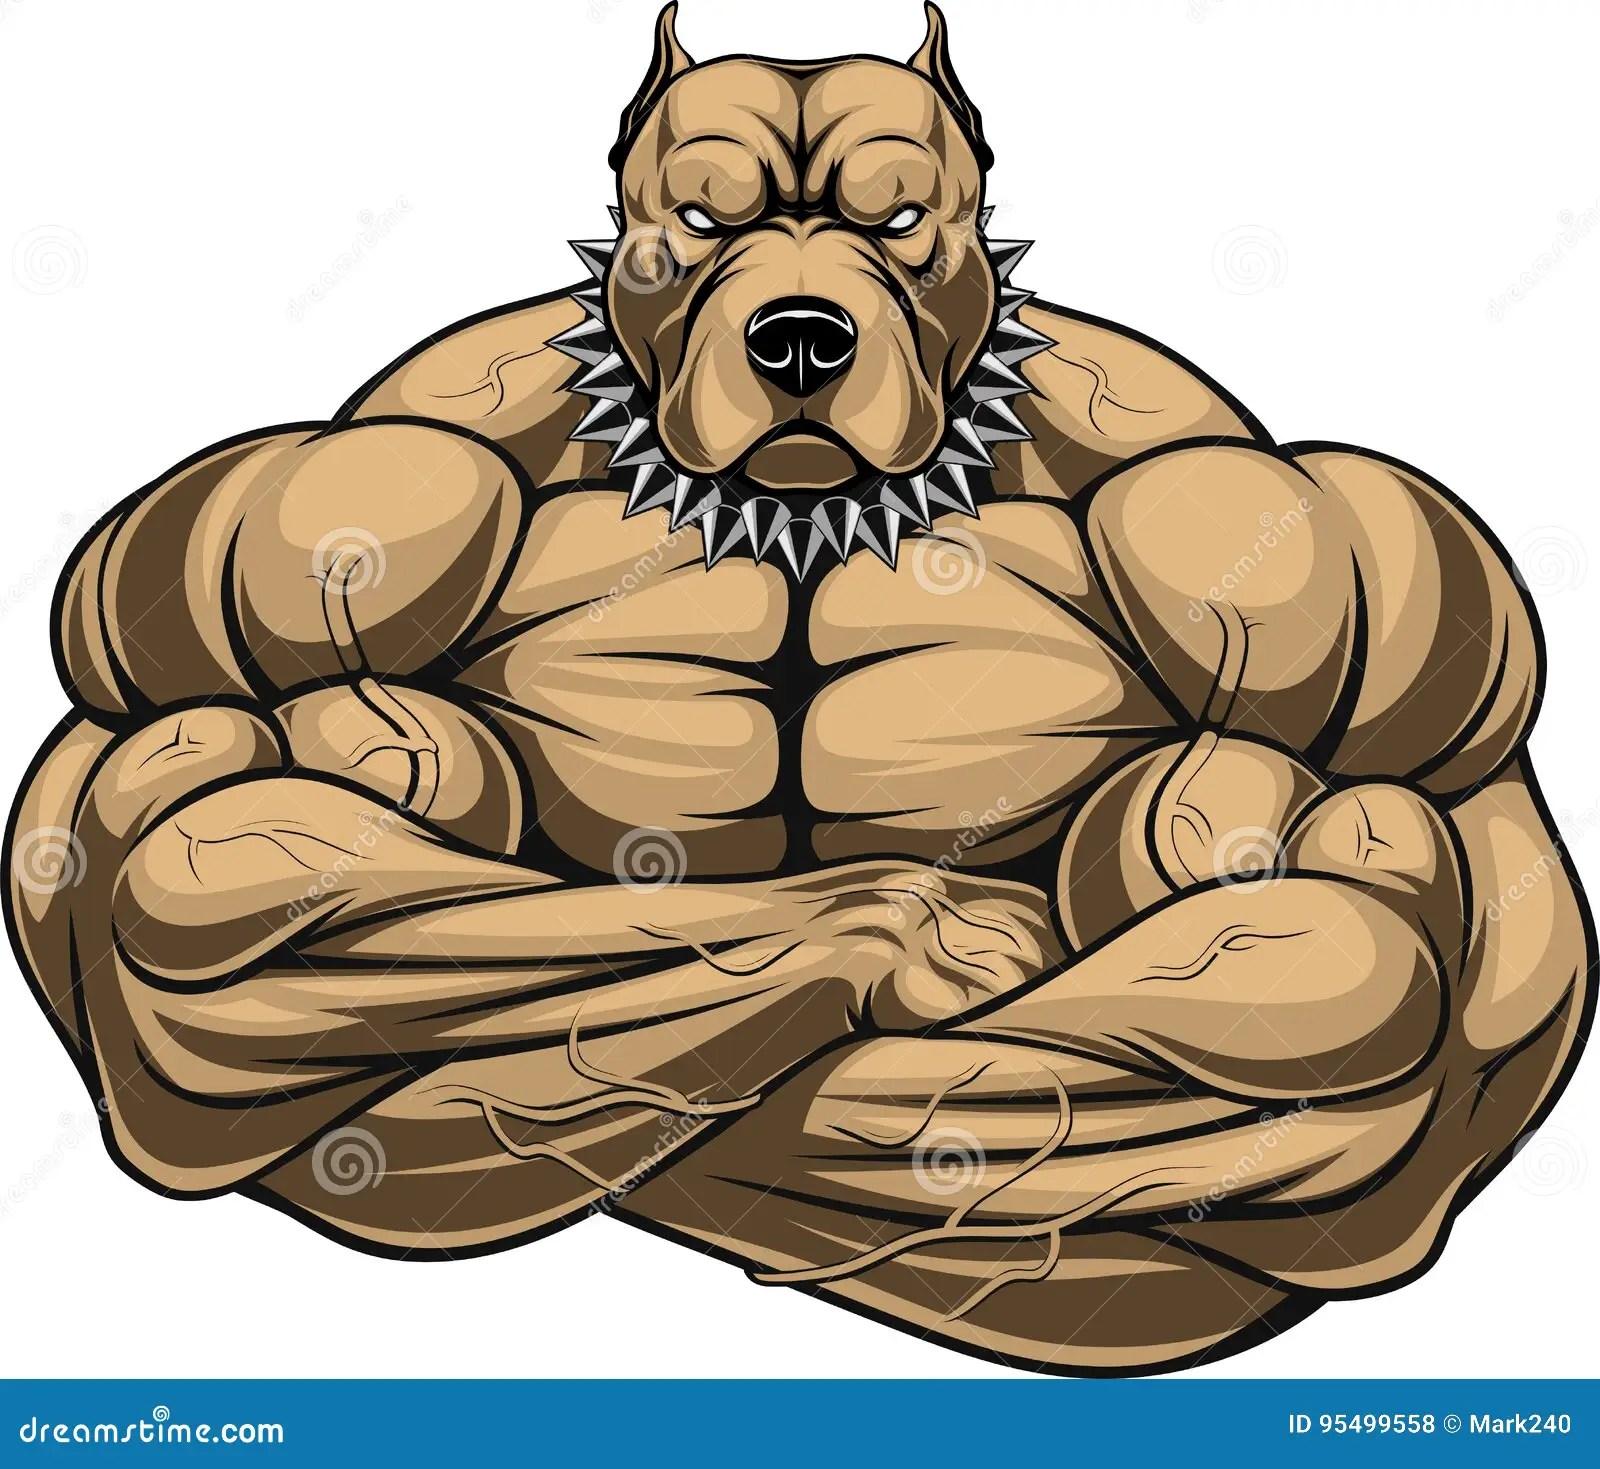 Bulldog Drawing Muscle